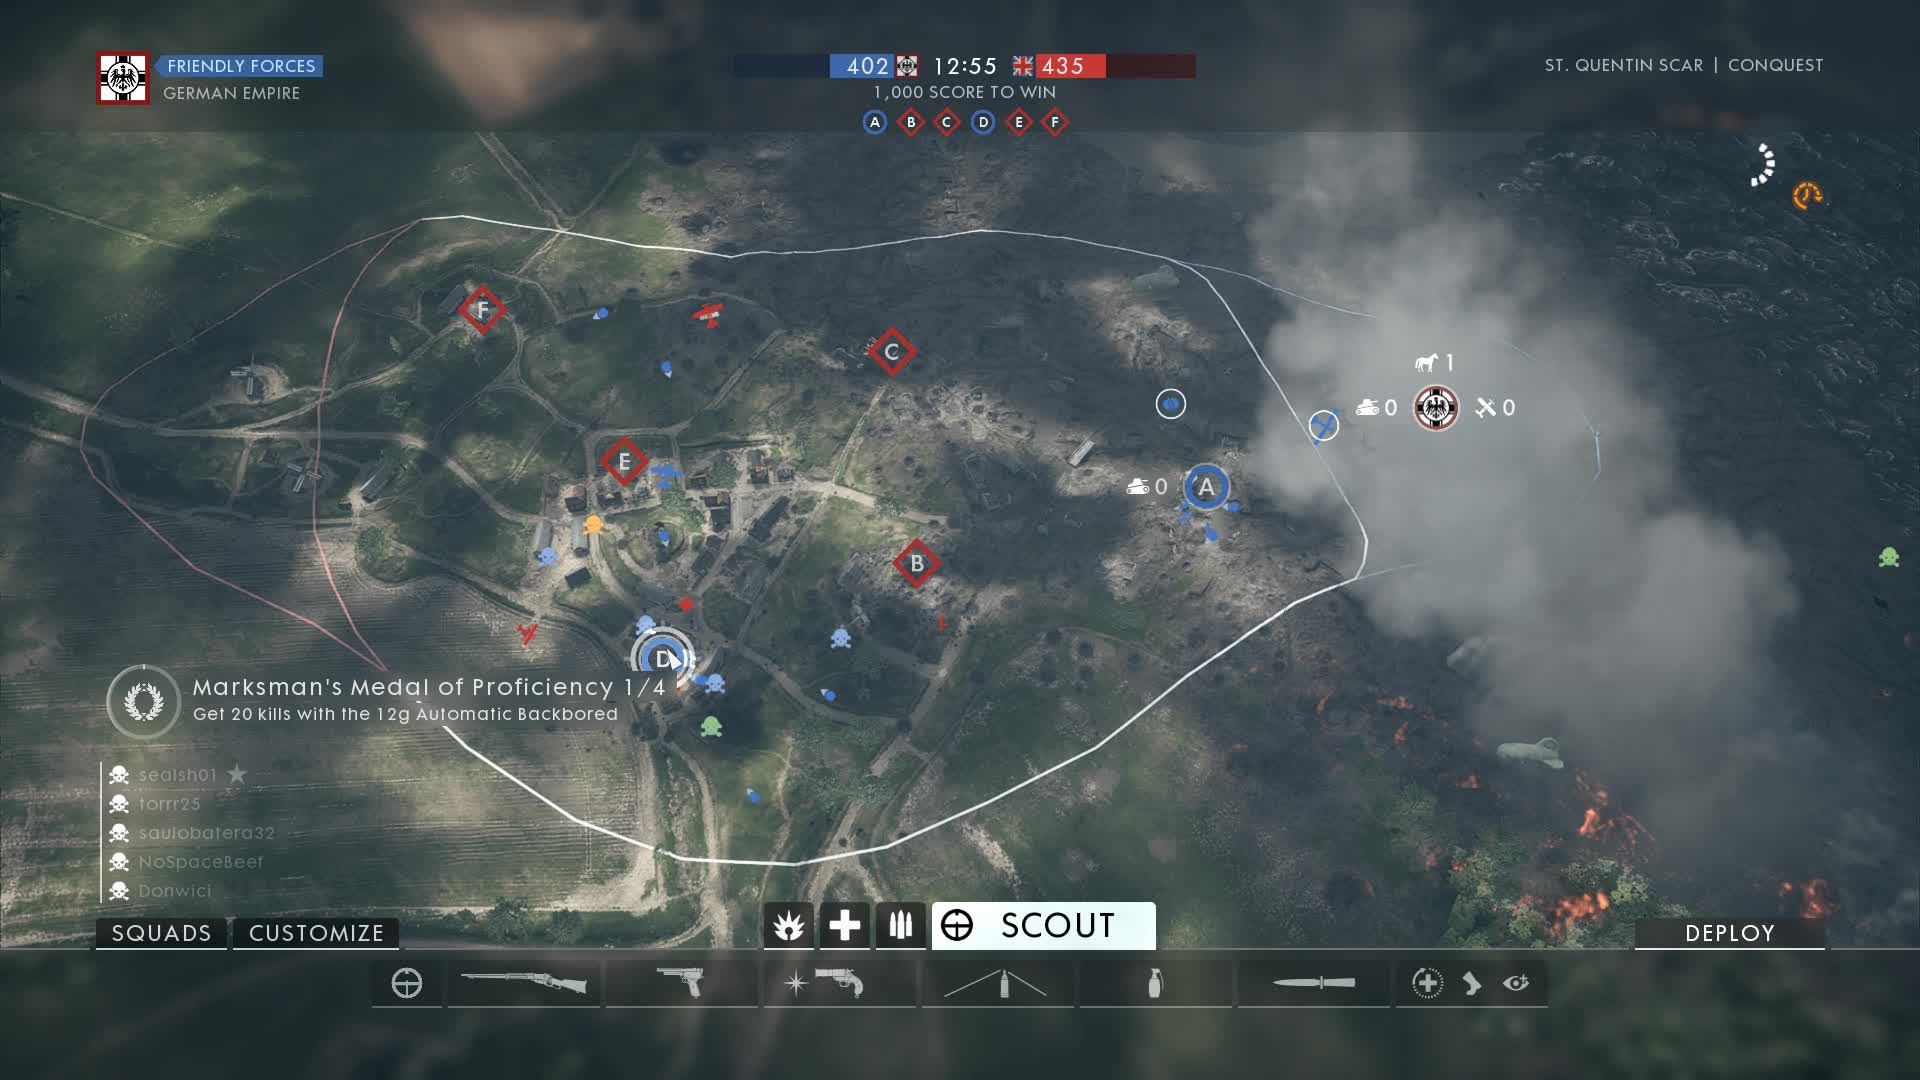 battlefield1, vlc-record-2018-11-30-14h06m06s-Battlefield 1 2018.11.30 - 12.08.57.04.DVR.mp4- GIFs